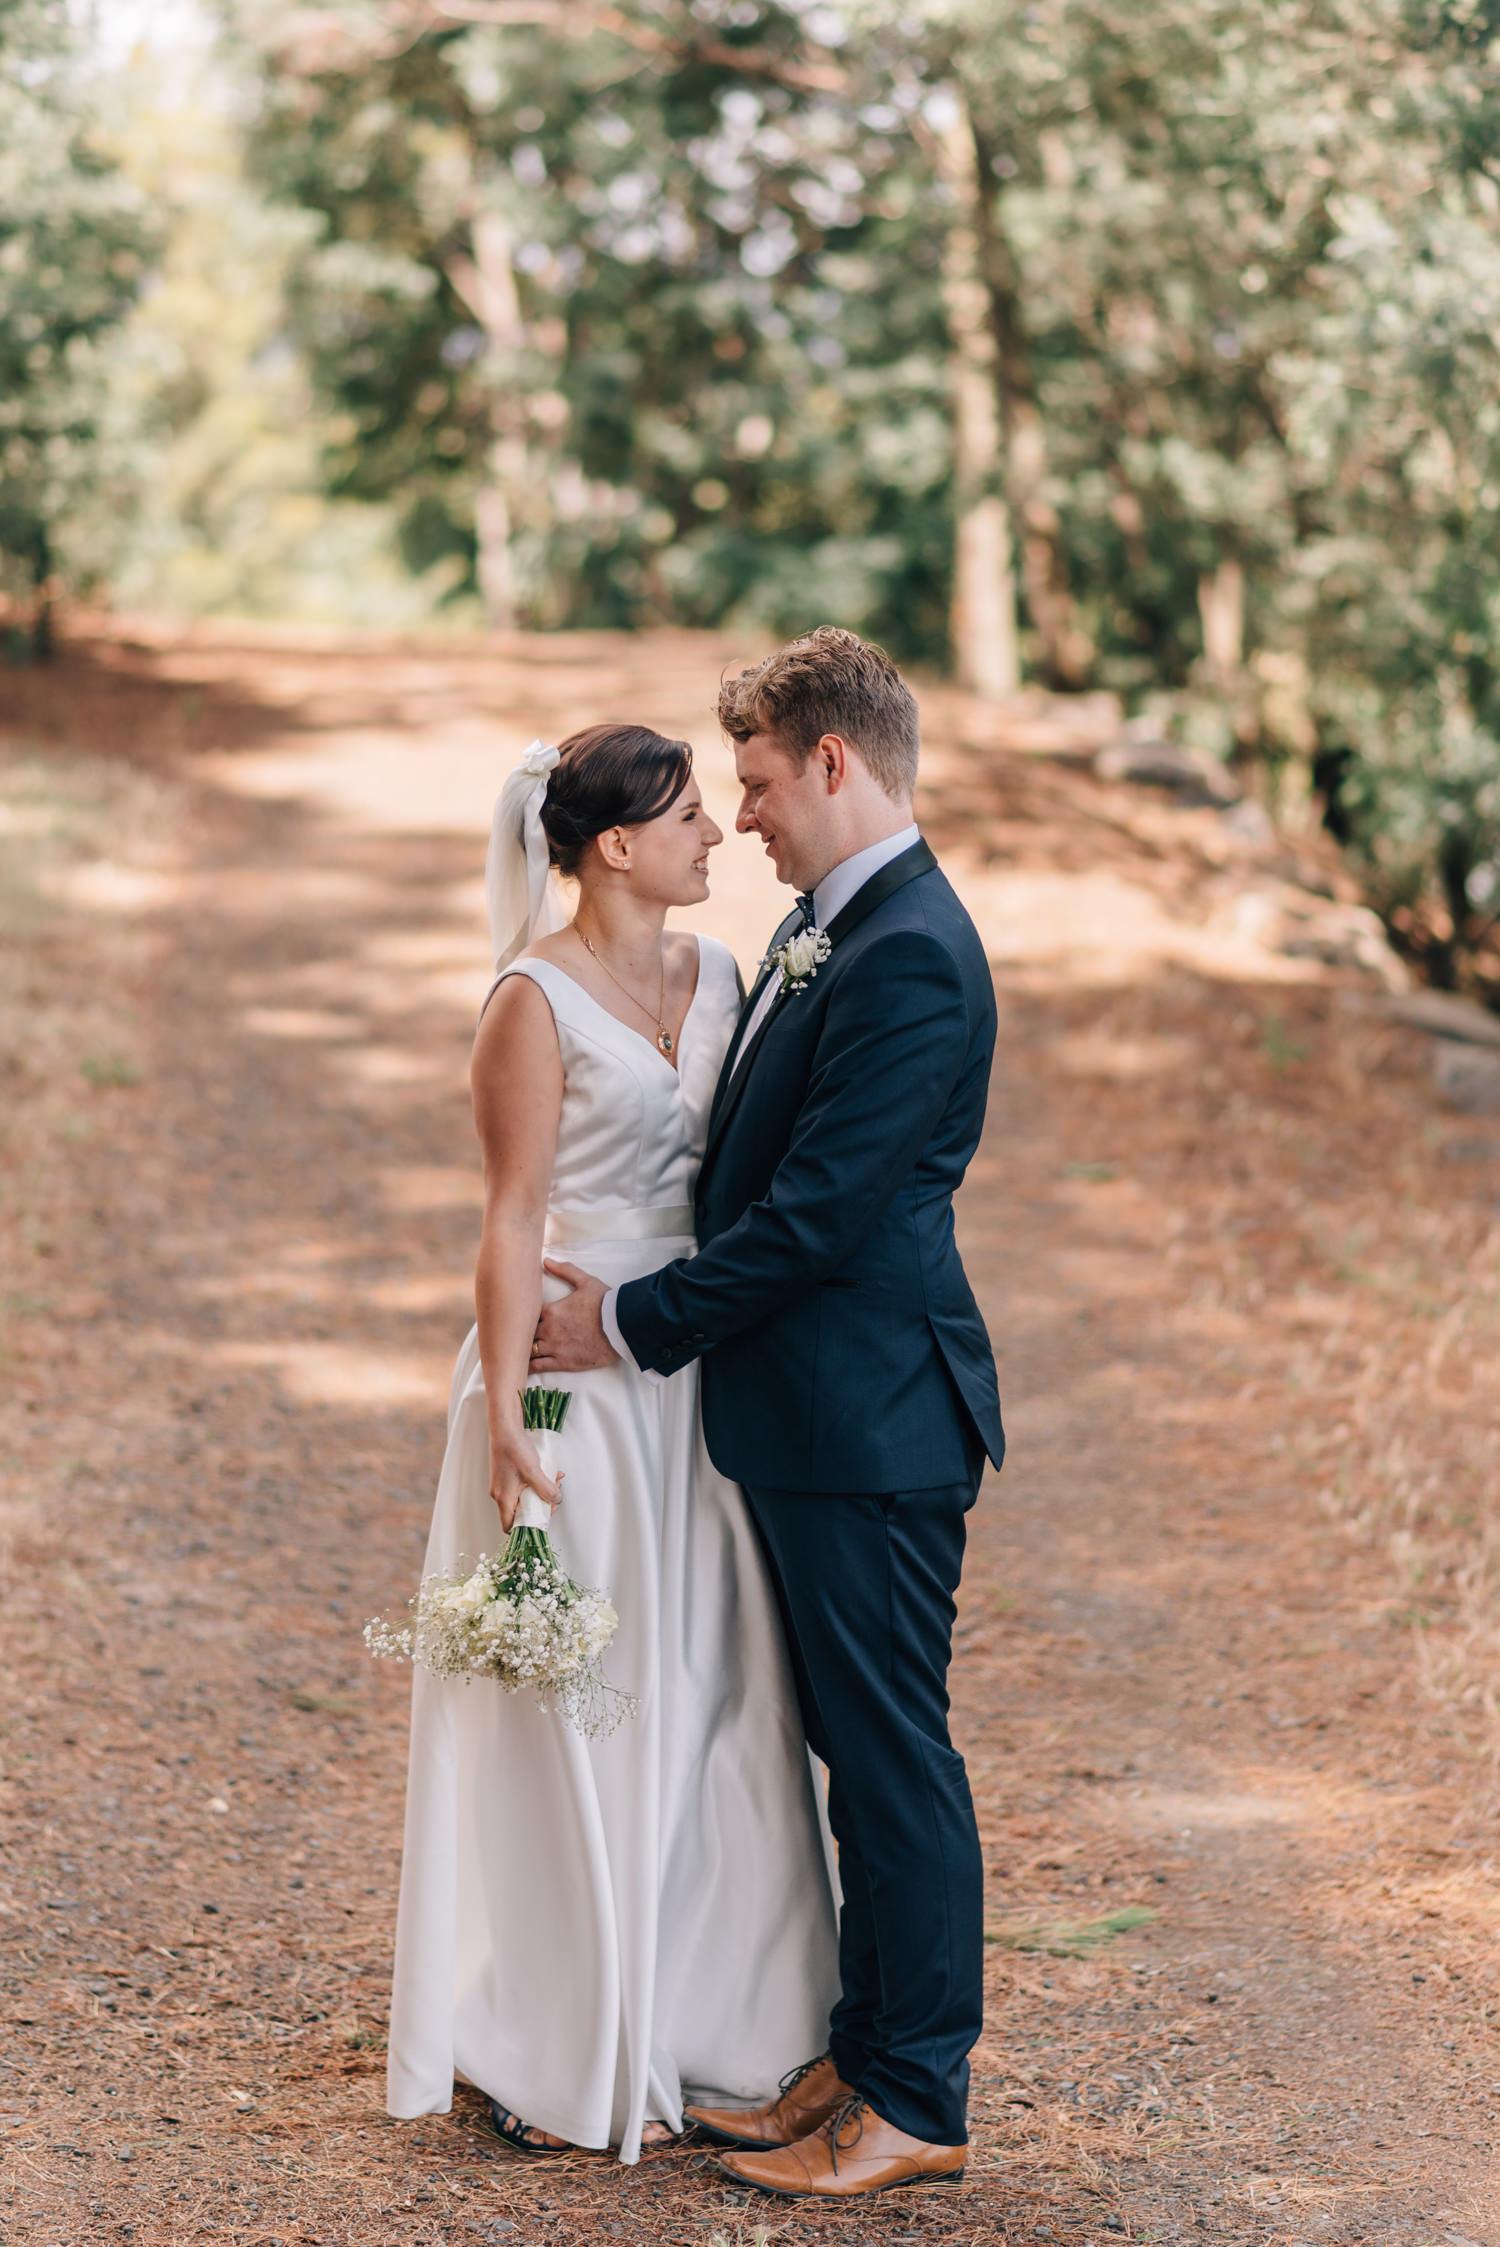 Josef-Chromy-Wedding-Photographer-49.jpg